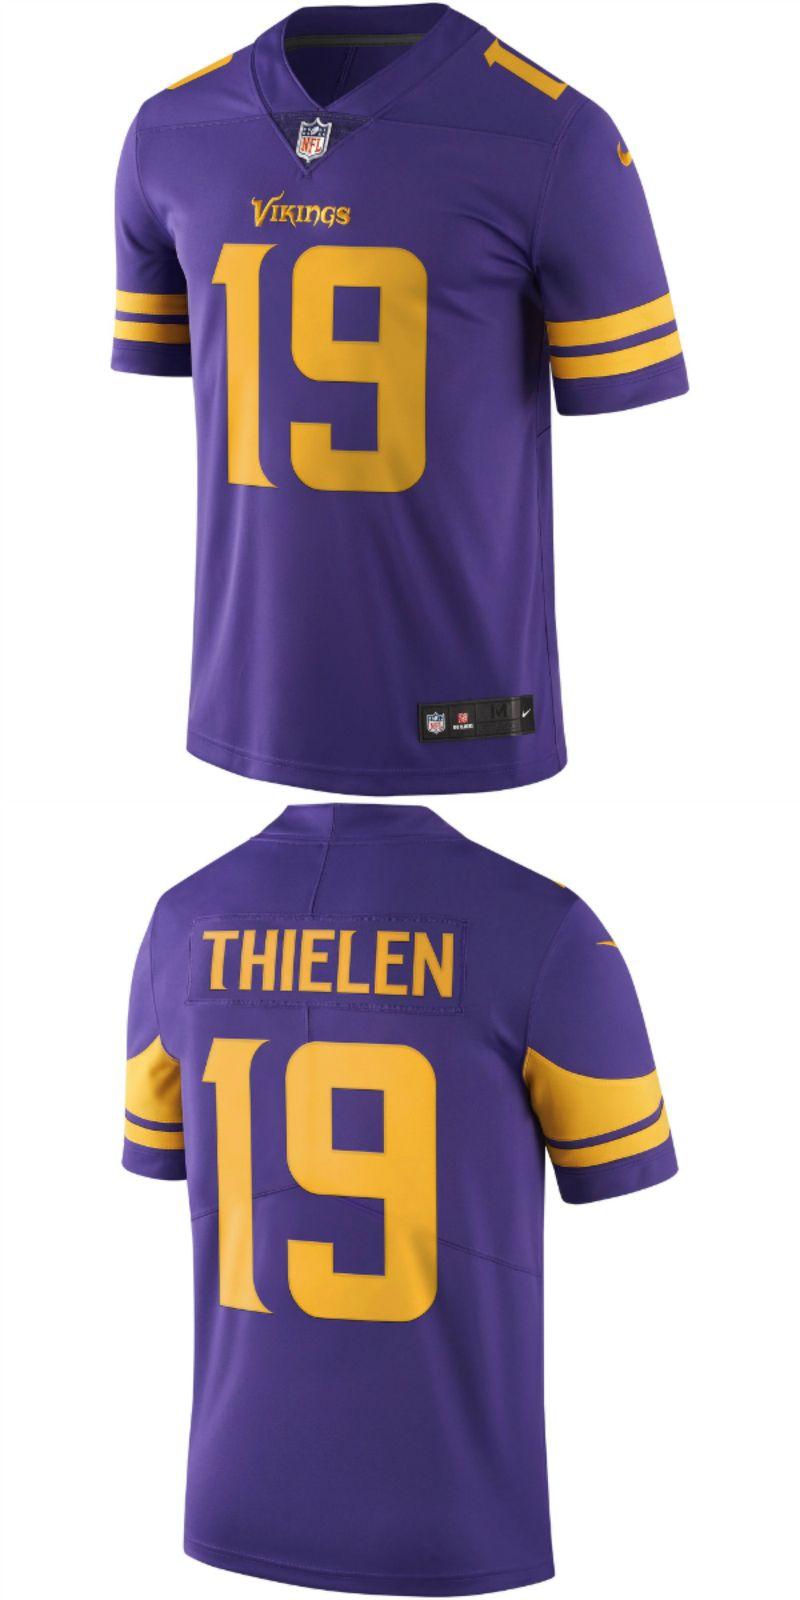 new arrival 6cf56 e25e4 UP TO 70% OFF. Adam Thielen Minnesota Vikings Nike Vapor ...